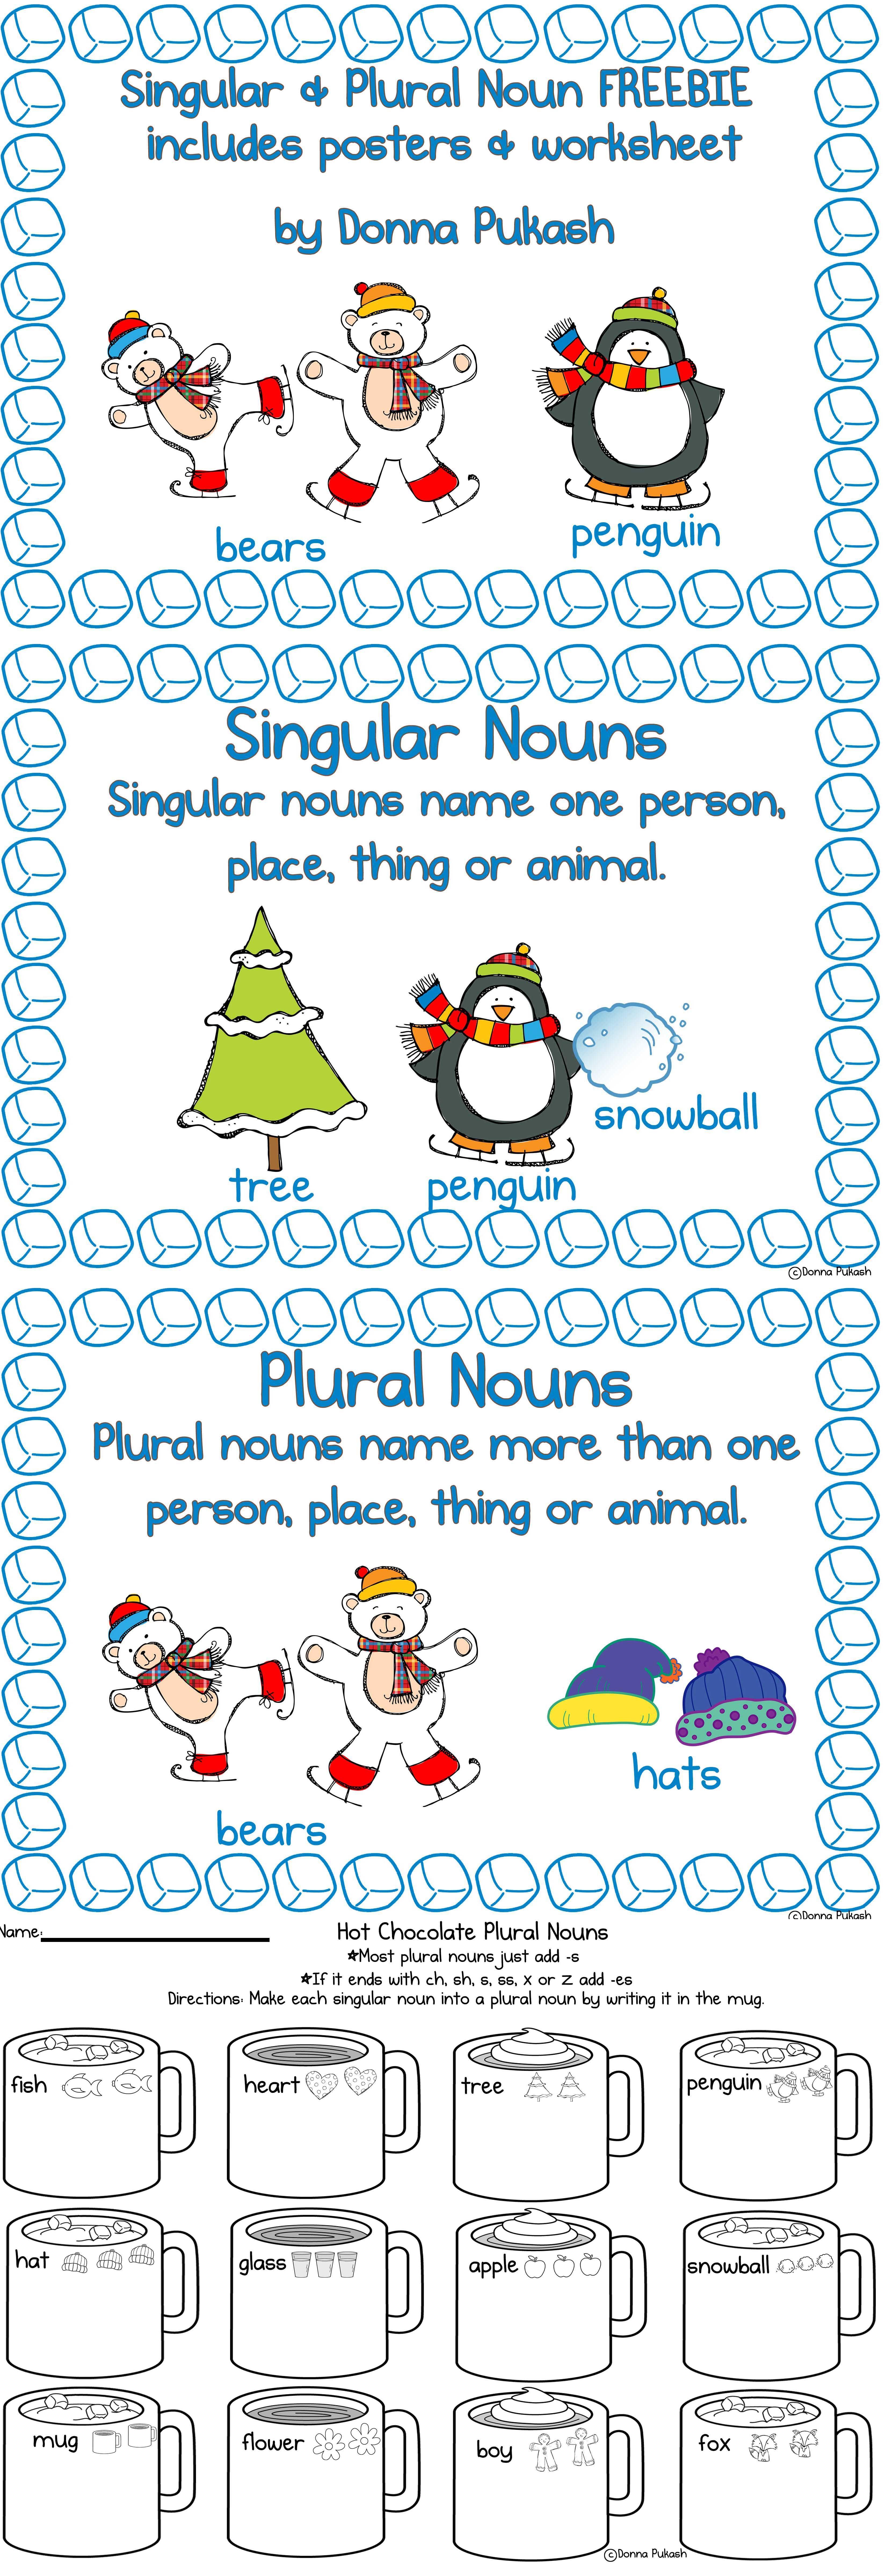 Hot Chocolate Singular Plural Nouns Freebie Singular And Plural Nouns Singular And Plural Plurals [ 9600 x 3300 Pixel ]